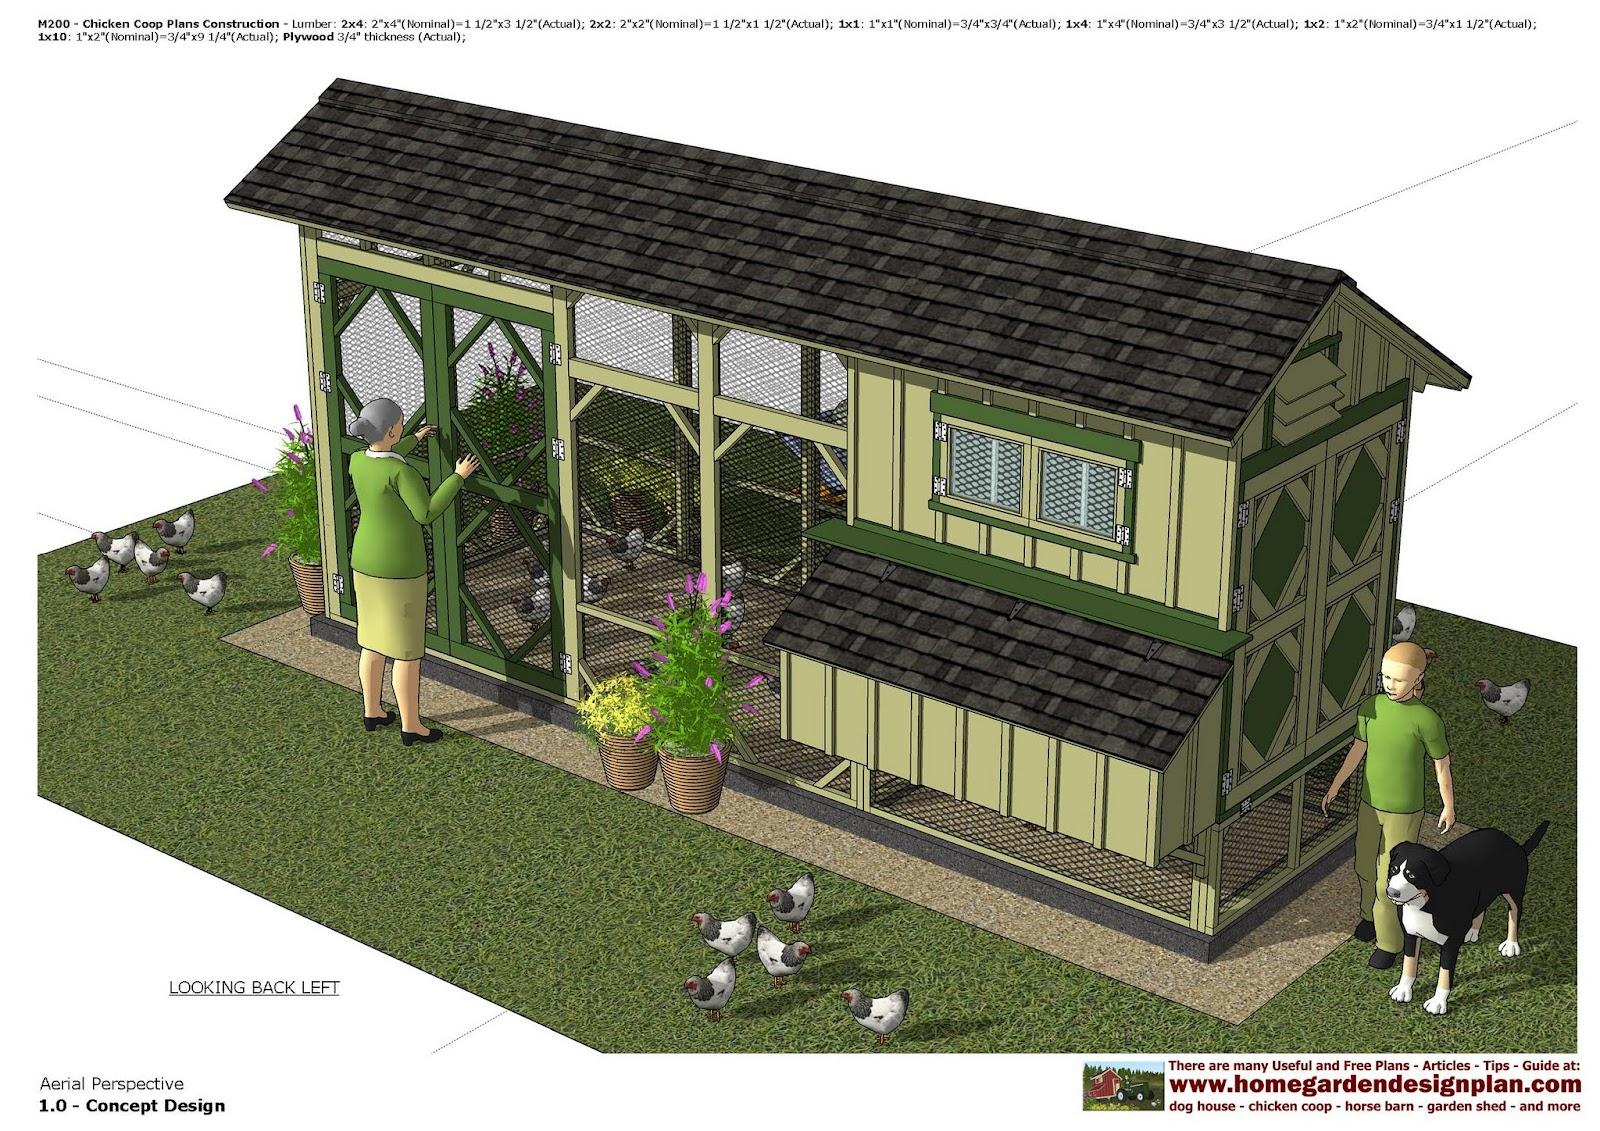 Home garden plans m200 chicken coop plans chicken for Coop house plans